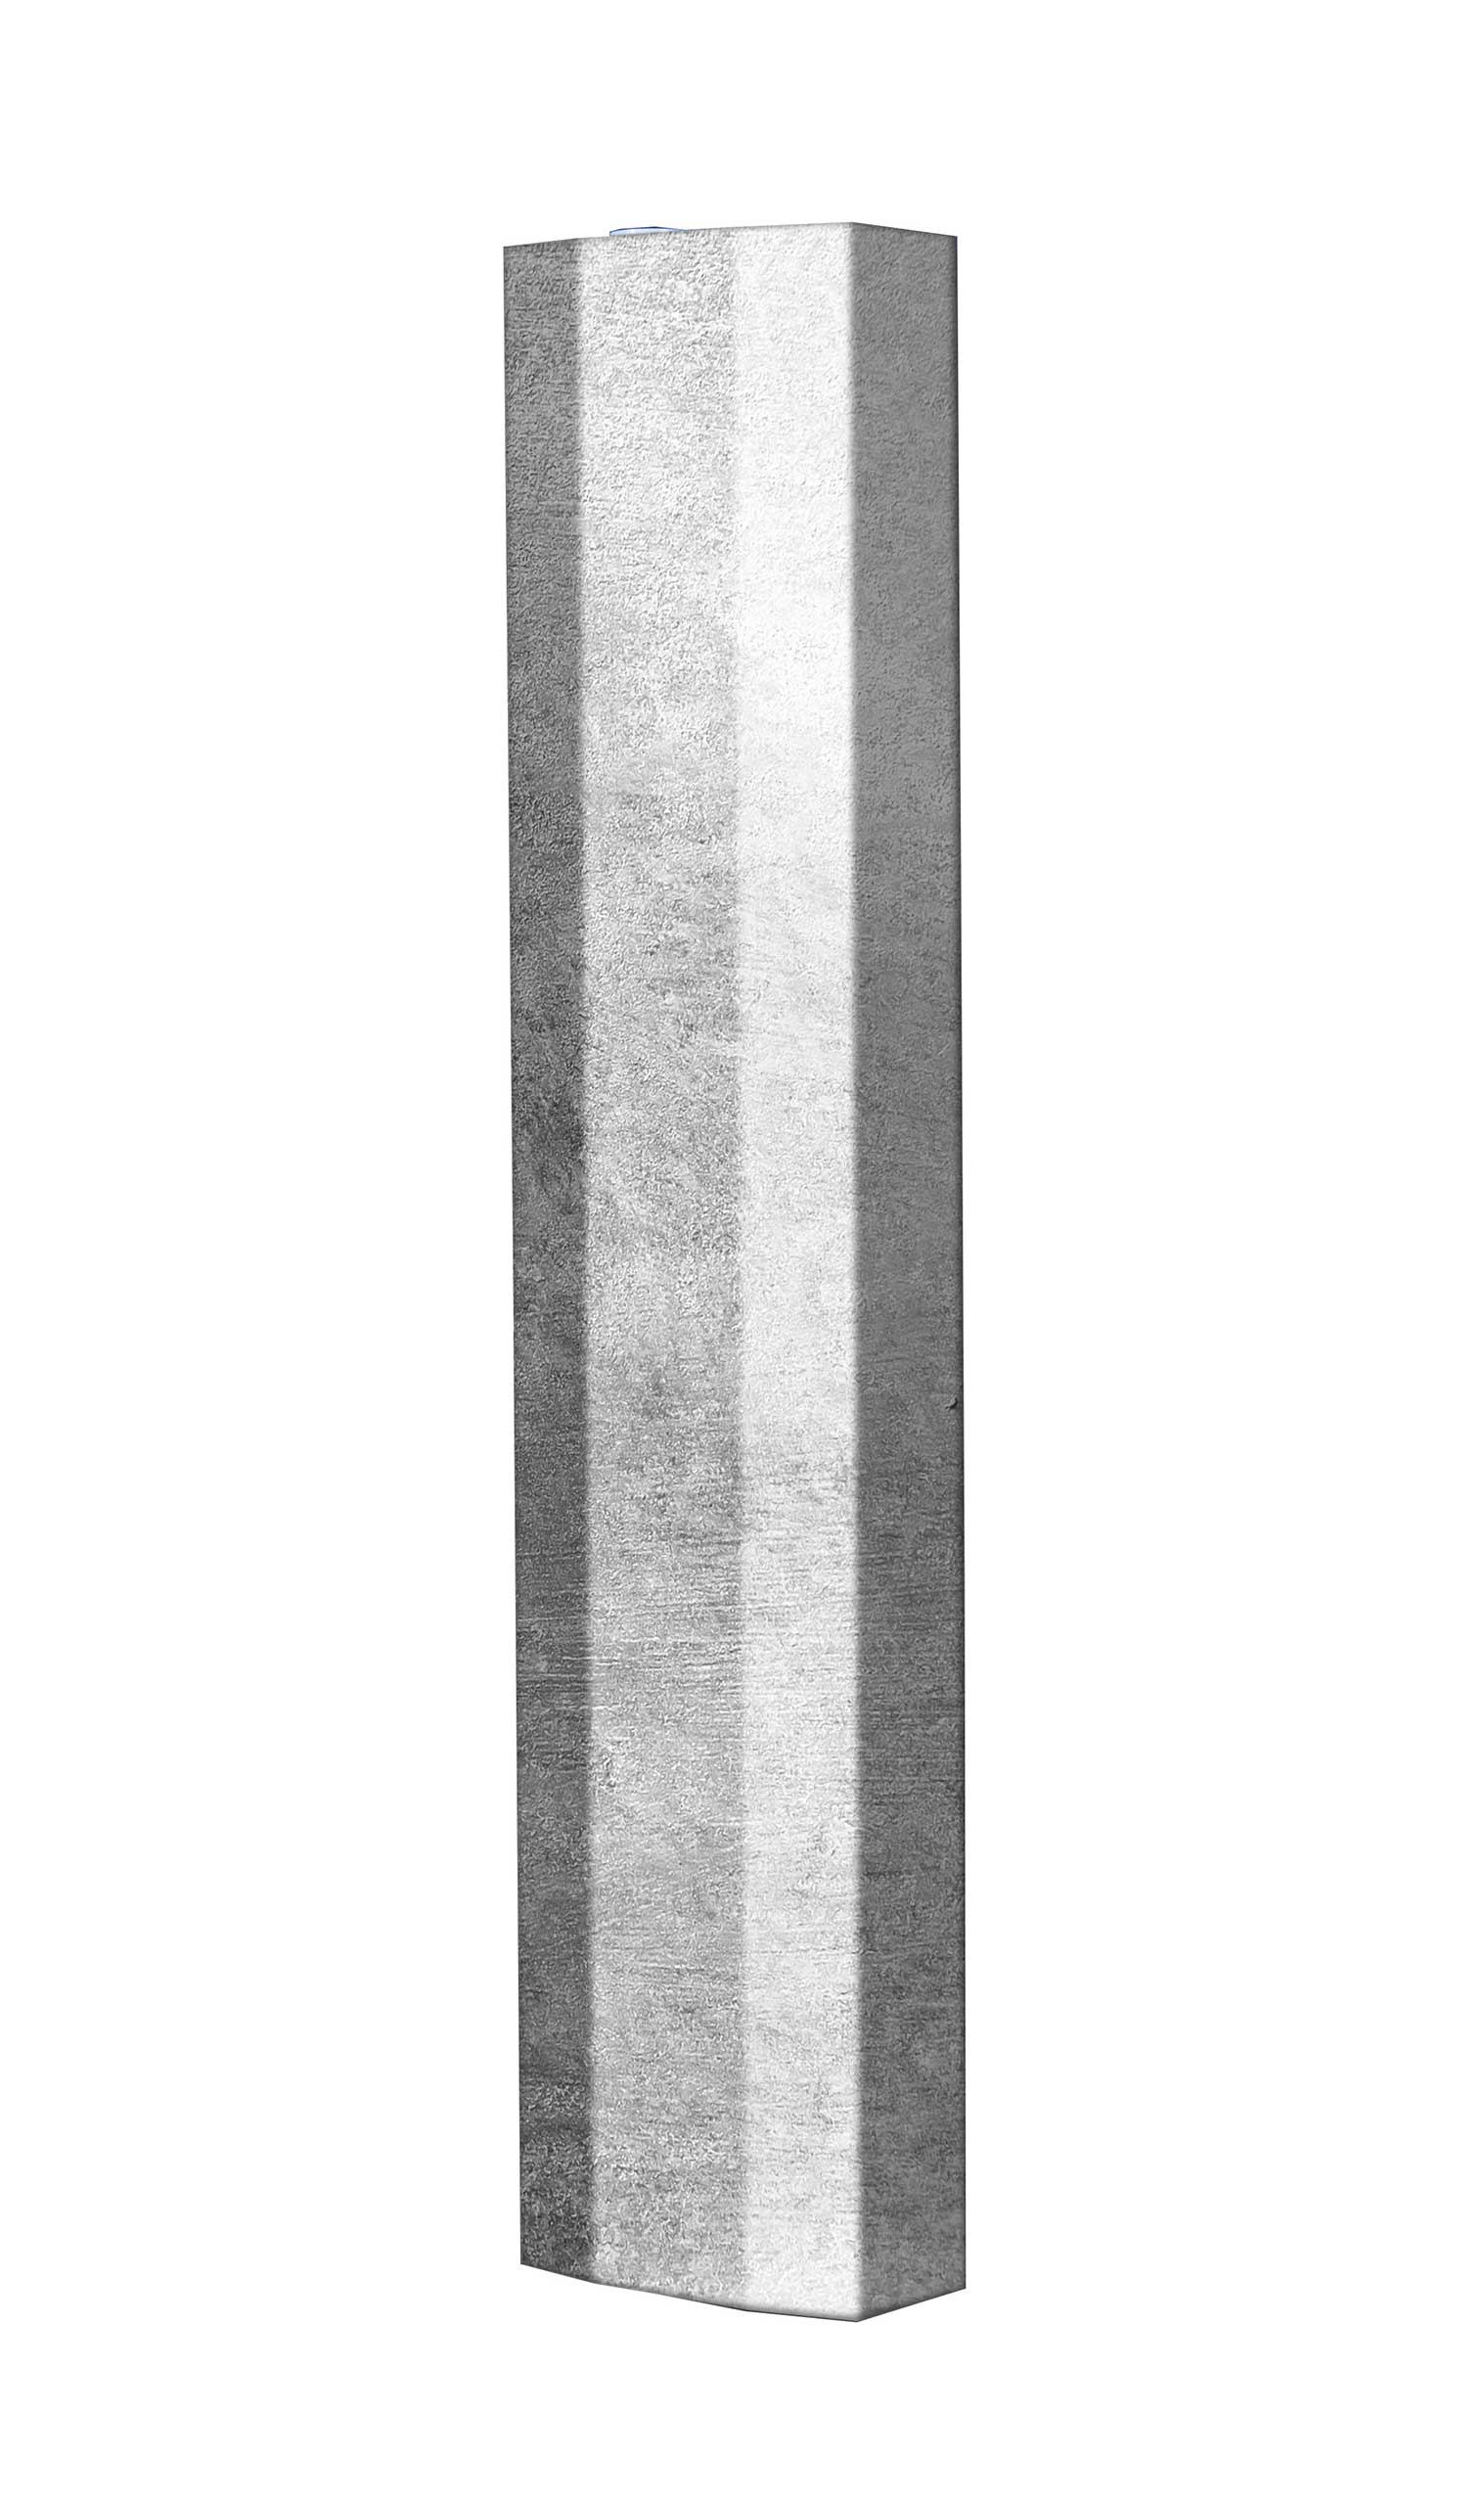 Schuhschrank STORM Motivschrank Single S101 Grau Muster weiß